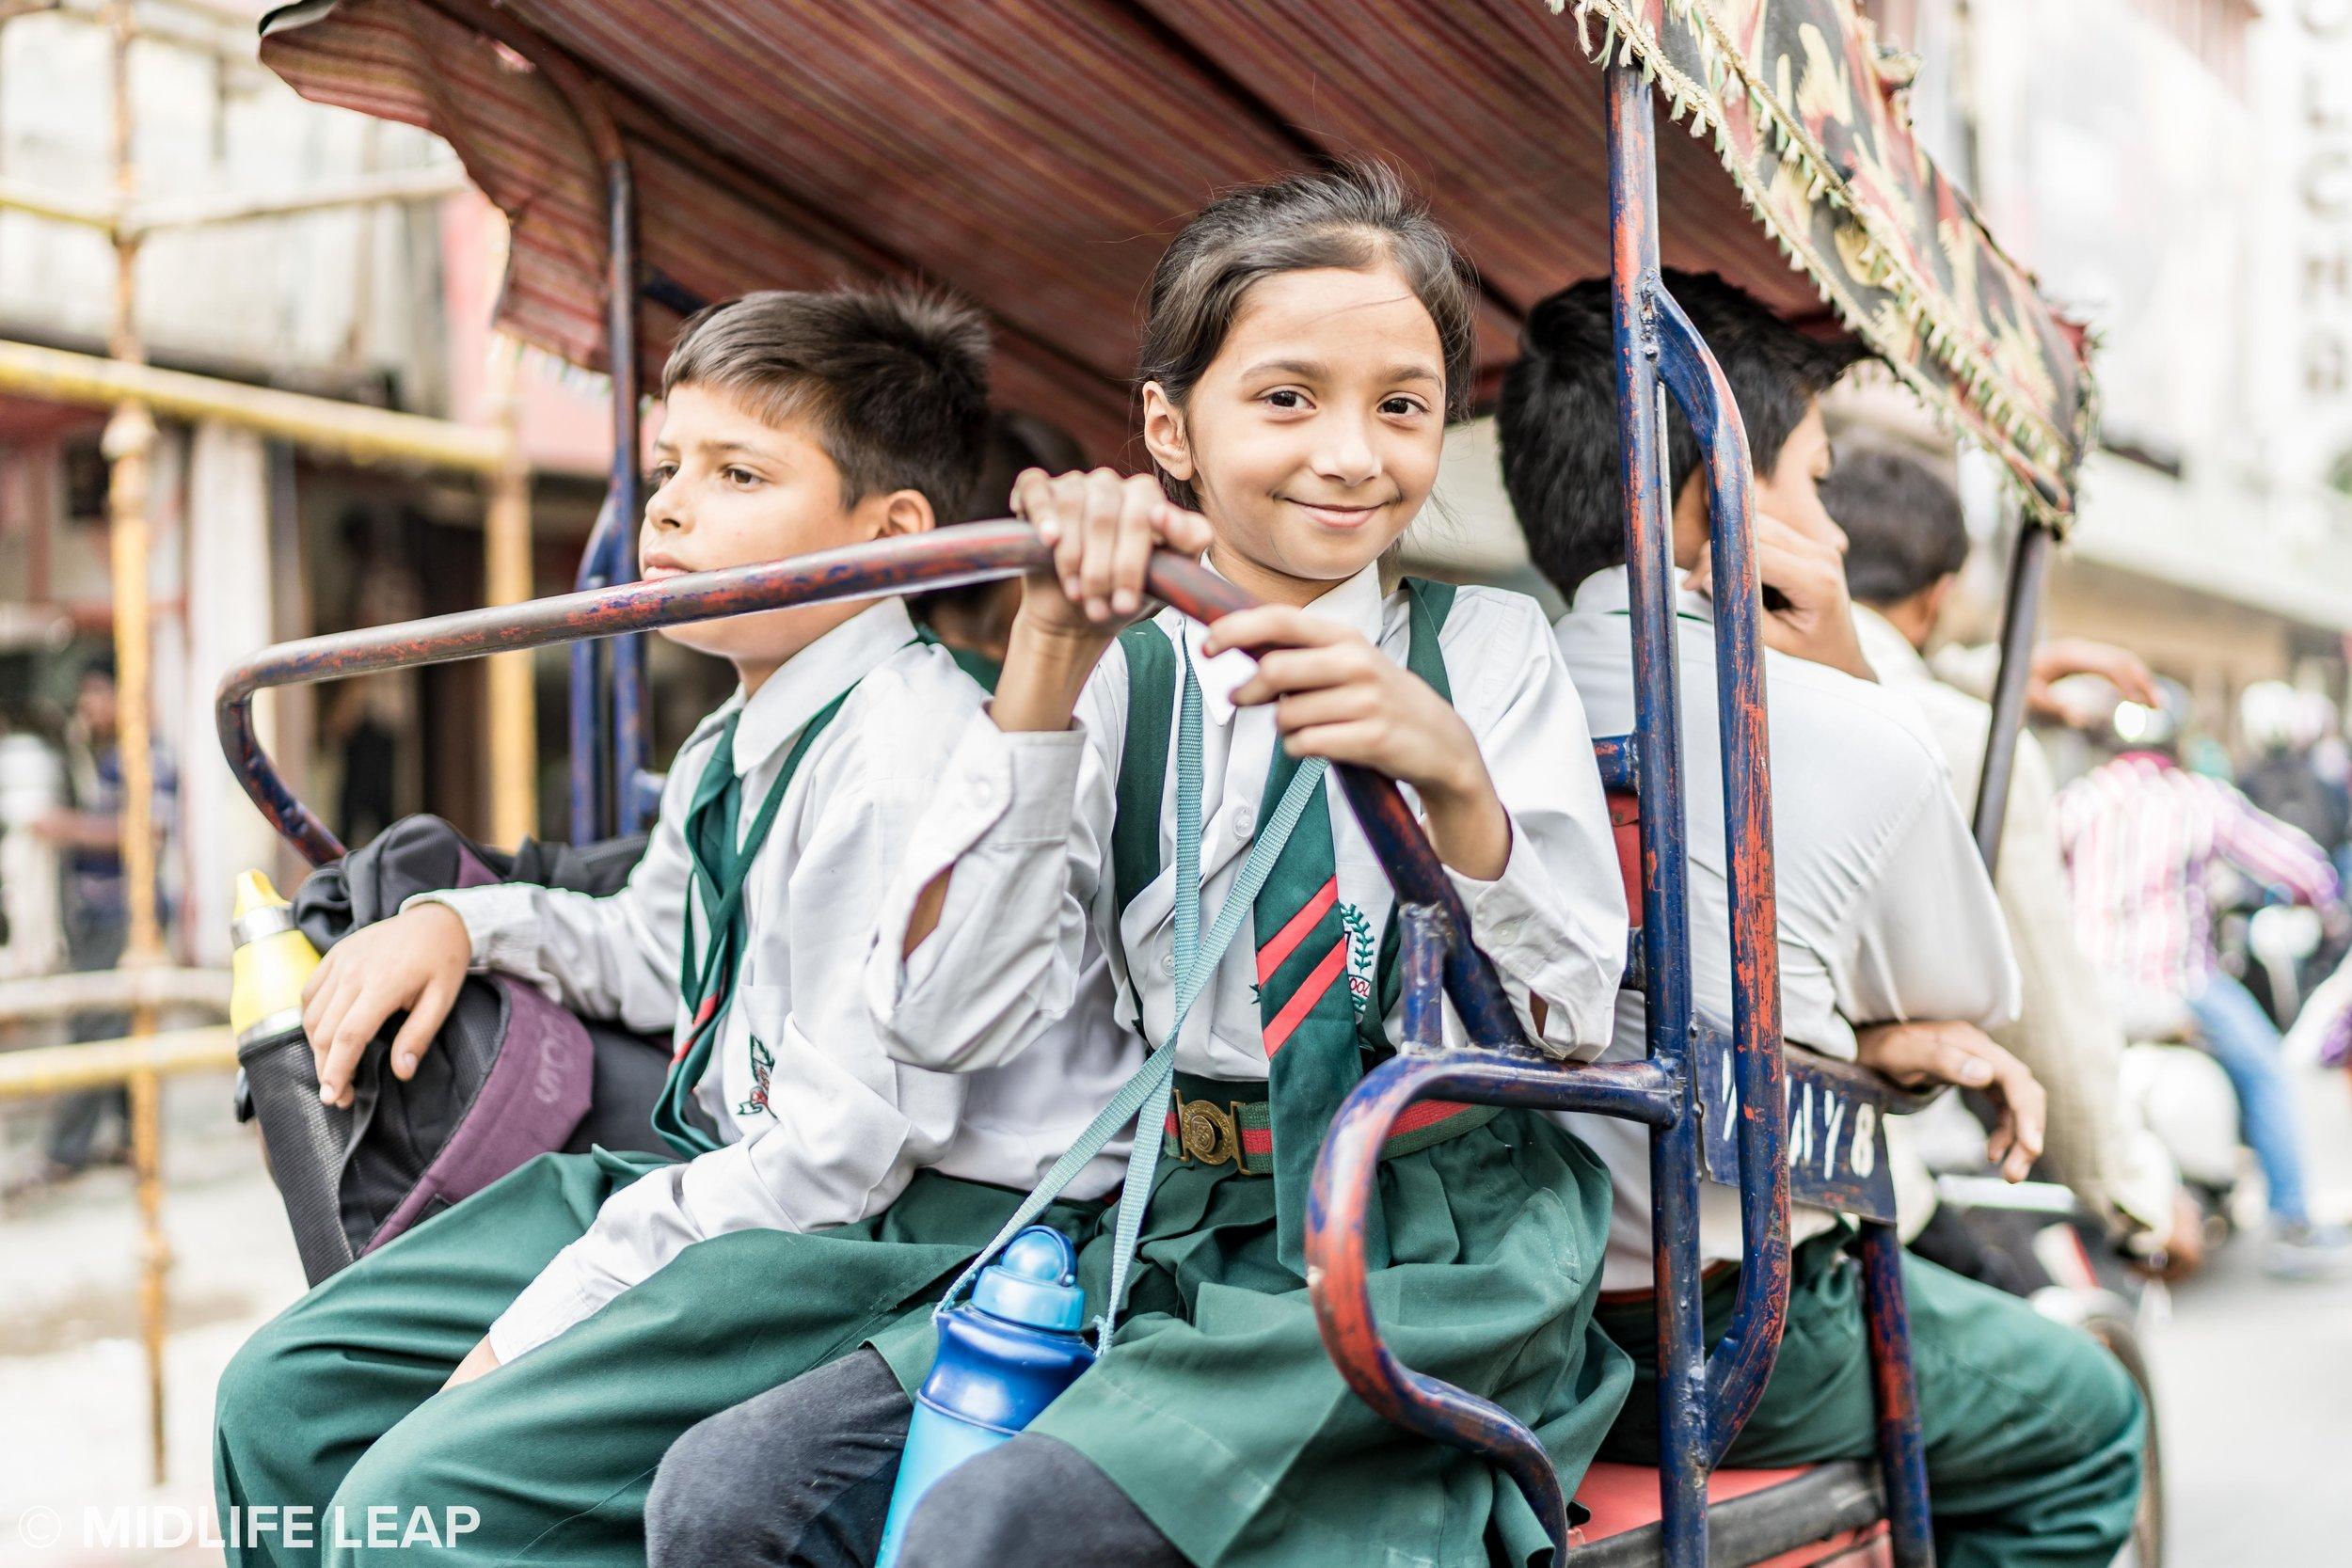 Rickshaw school bus